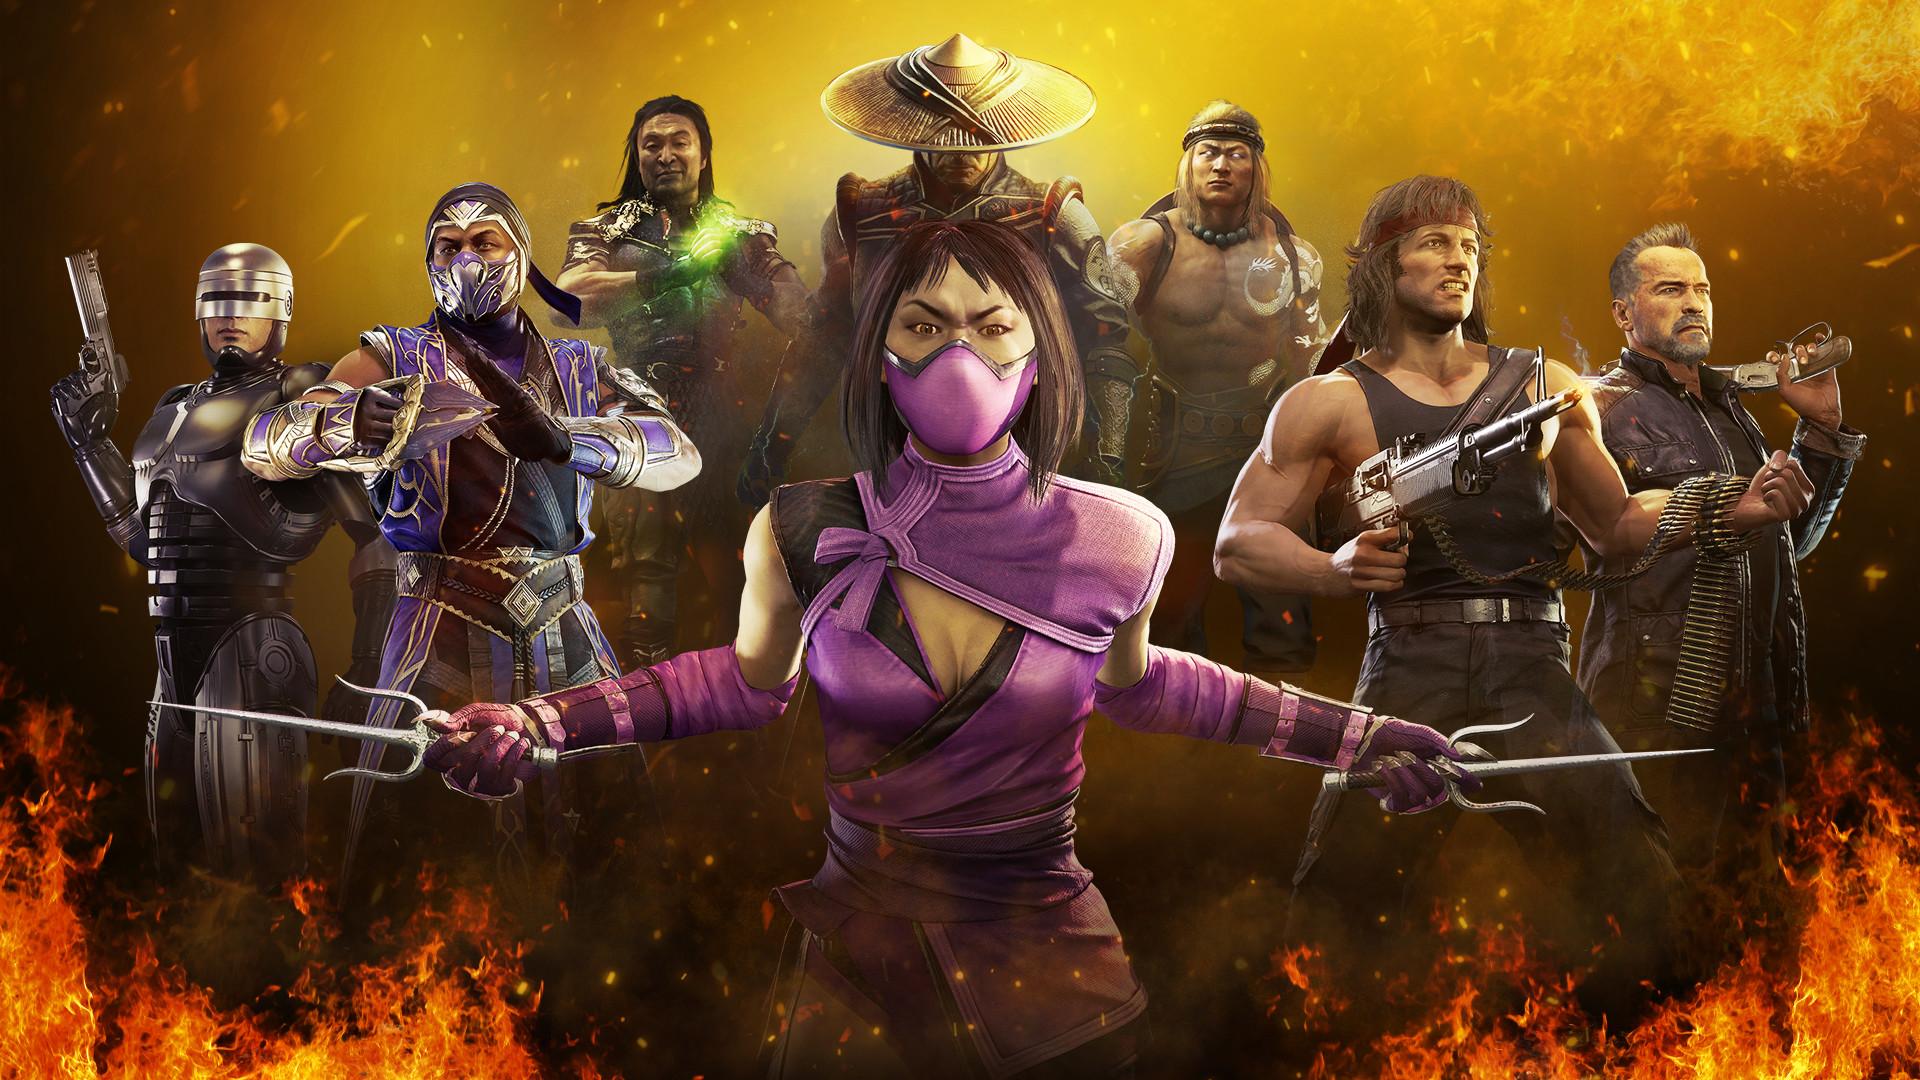 TGA 2020:《真人快打11终极版》获最佳格斗游戏